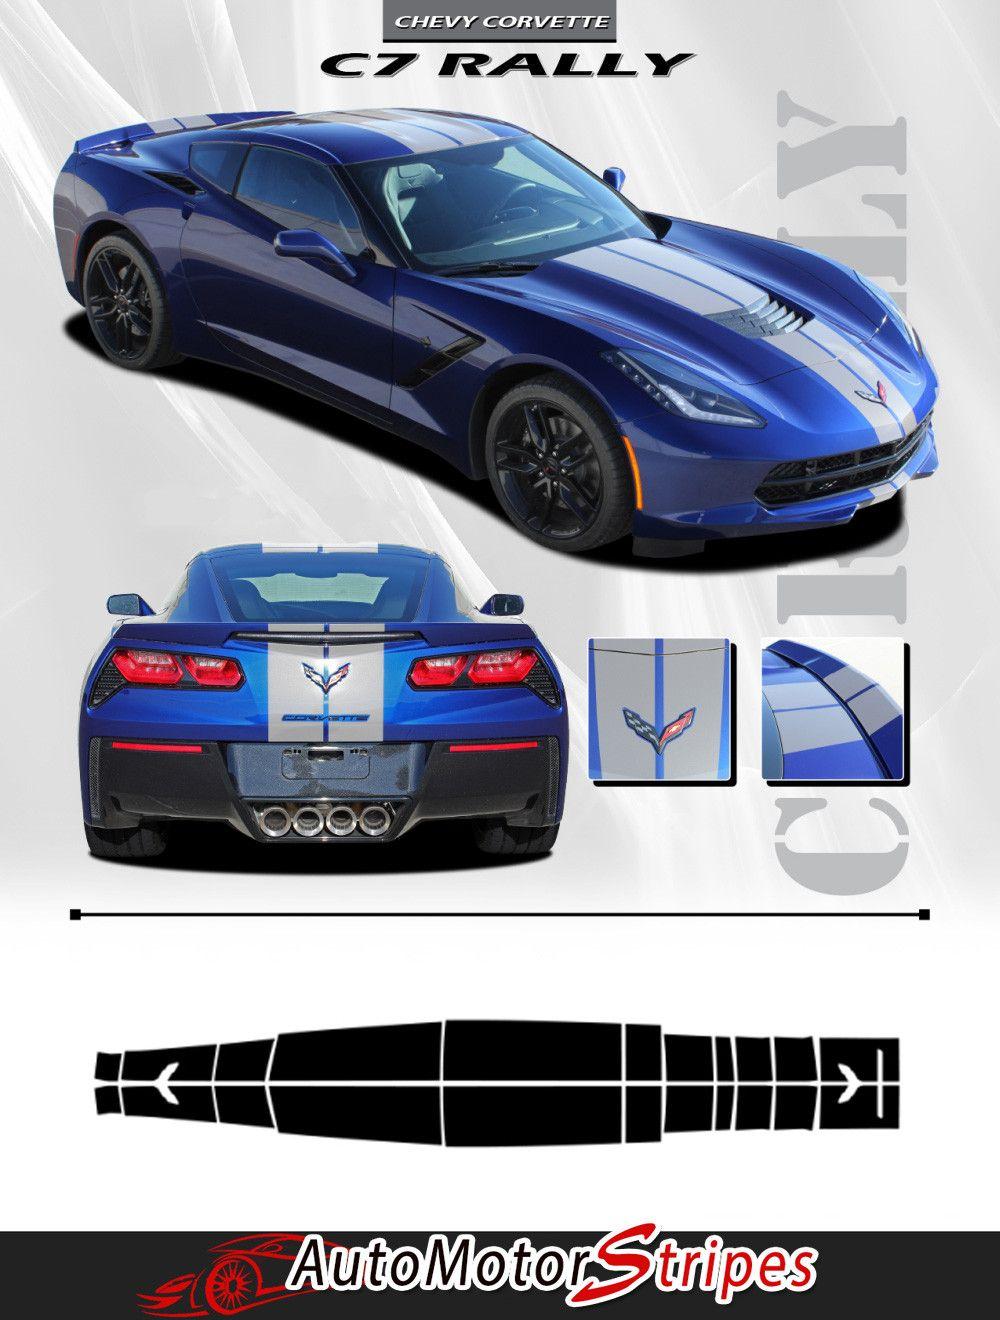 2014-2018 Chevy C7 Corvette Rally Racing Stripes Bumper